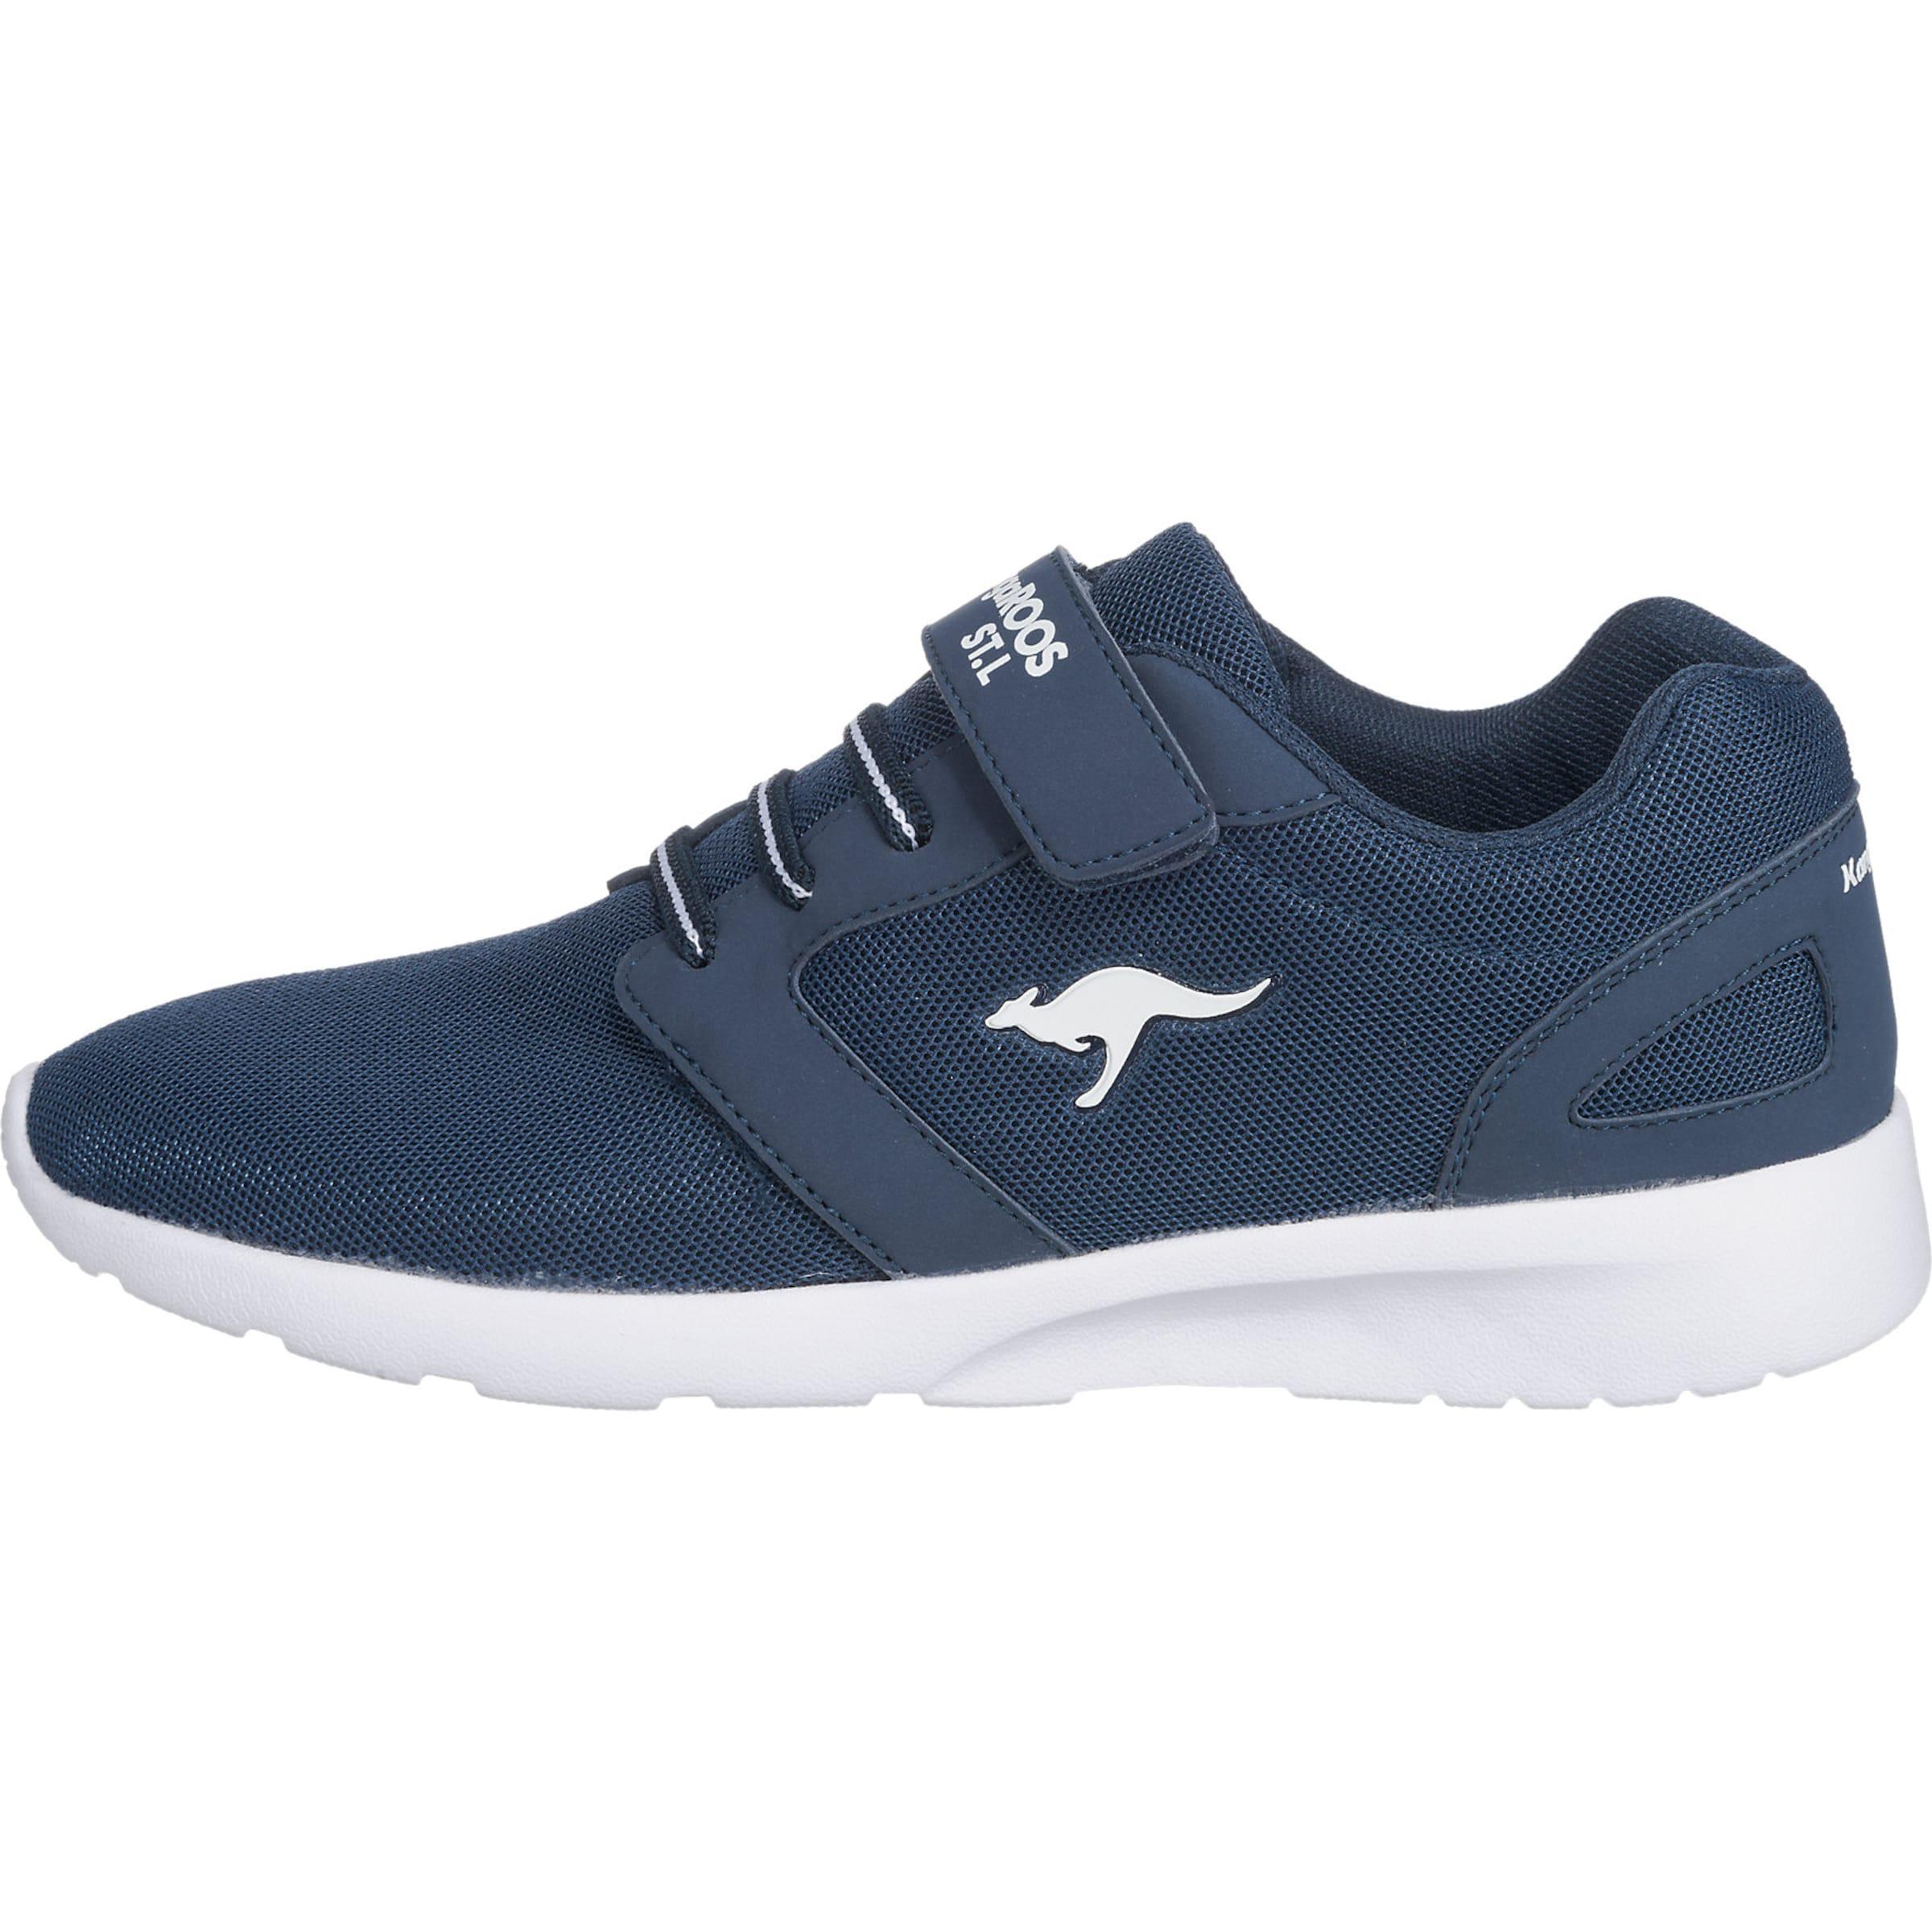 KangaROOS Nihu EV Sneakers Auf Dem Laufenden c22bYs41